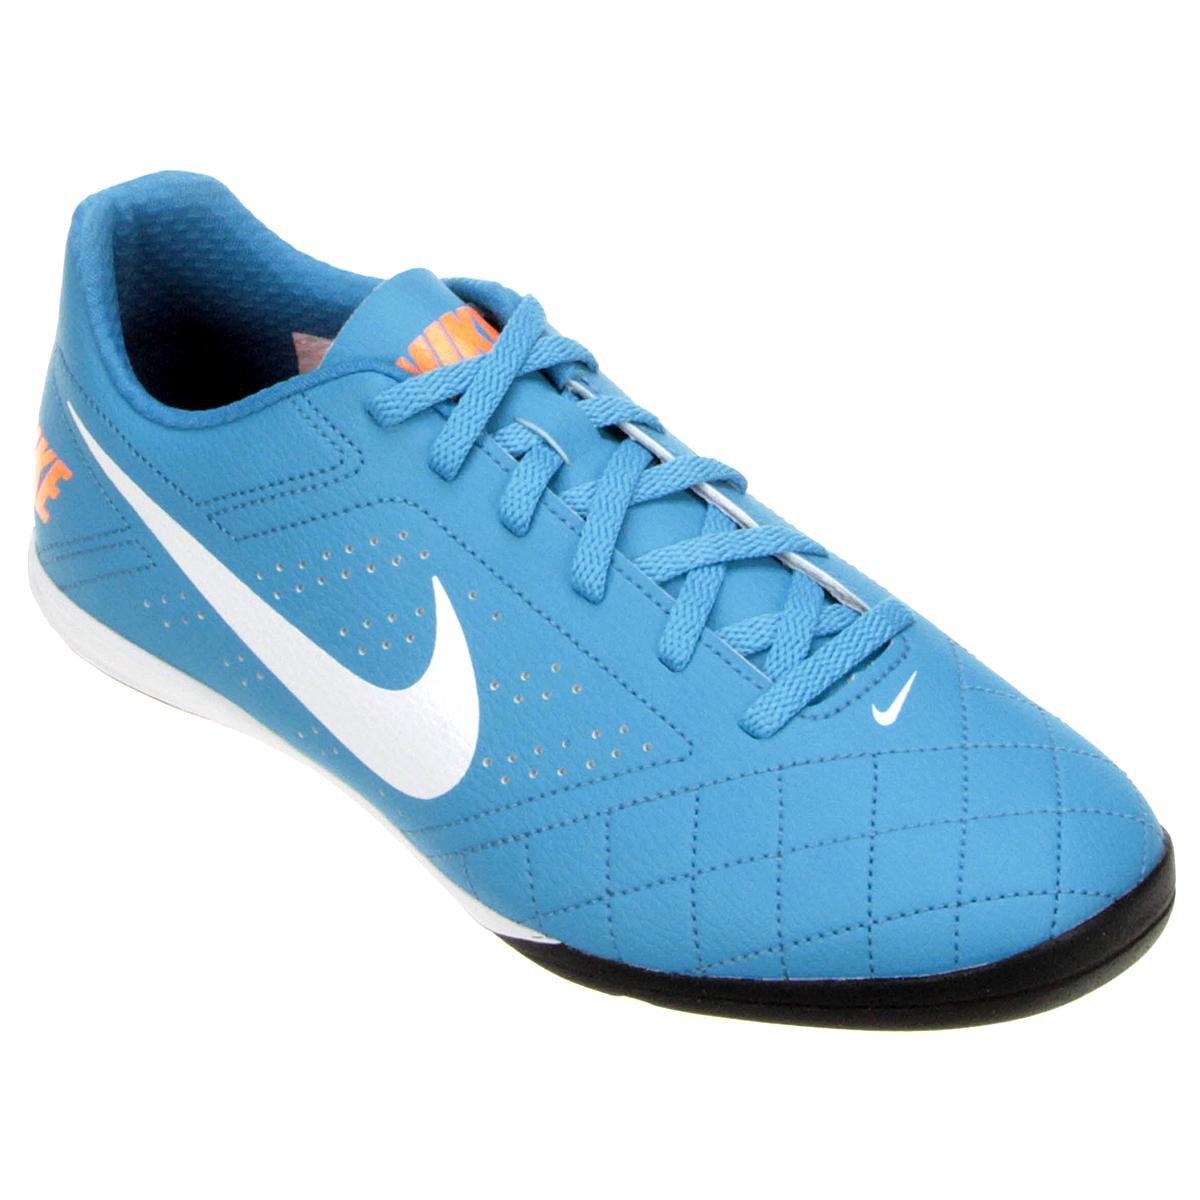 7ffd5fc931 Chuteira Futsal Nike Beco 2 Futsal - Azul e Branco - Compre Agora ...